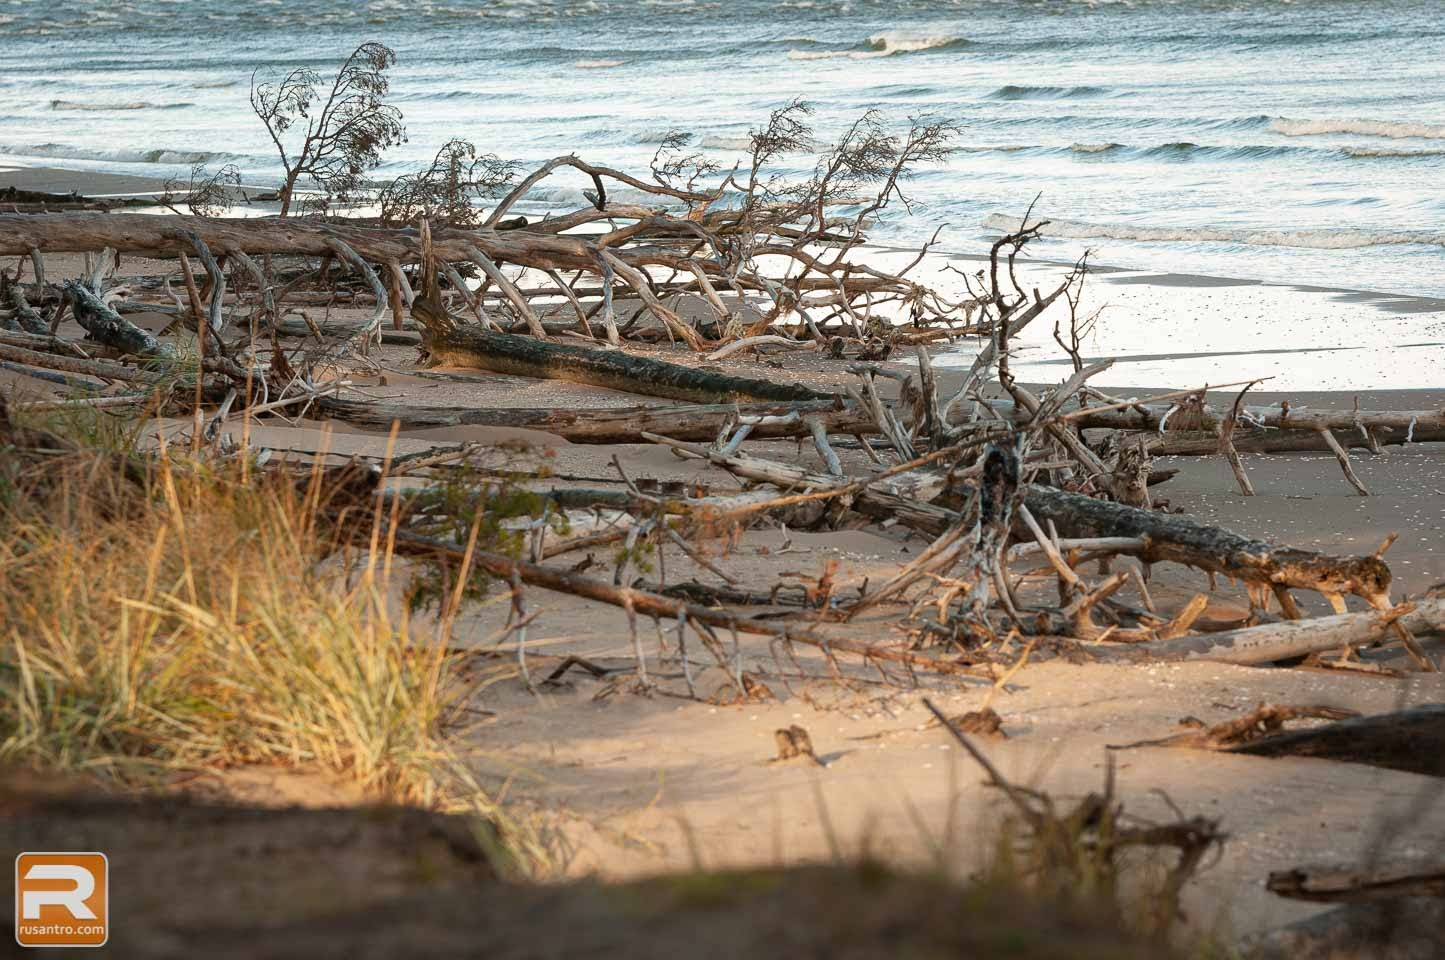 Jūras noskaloti un nogāztie koki